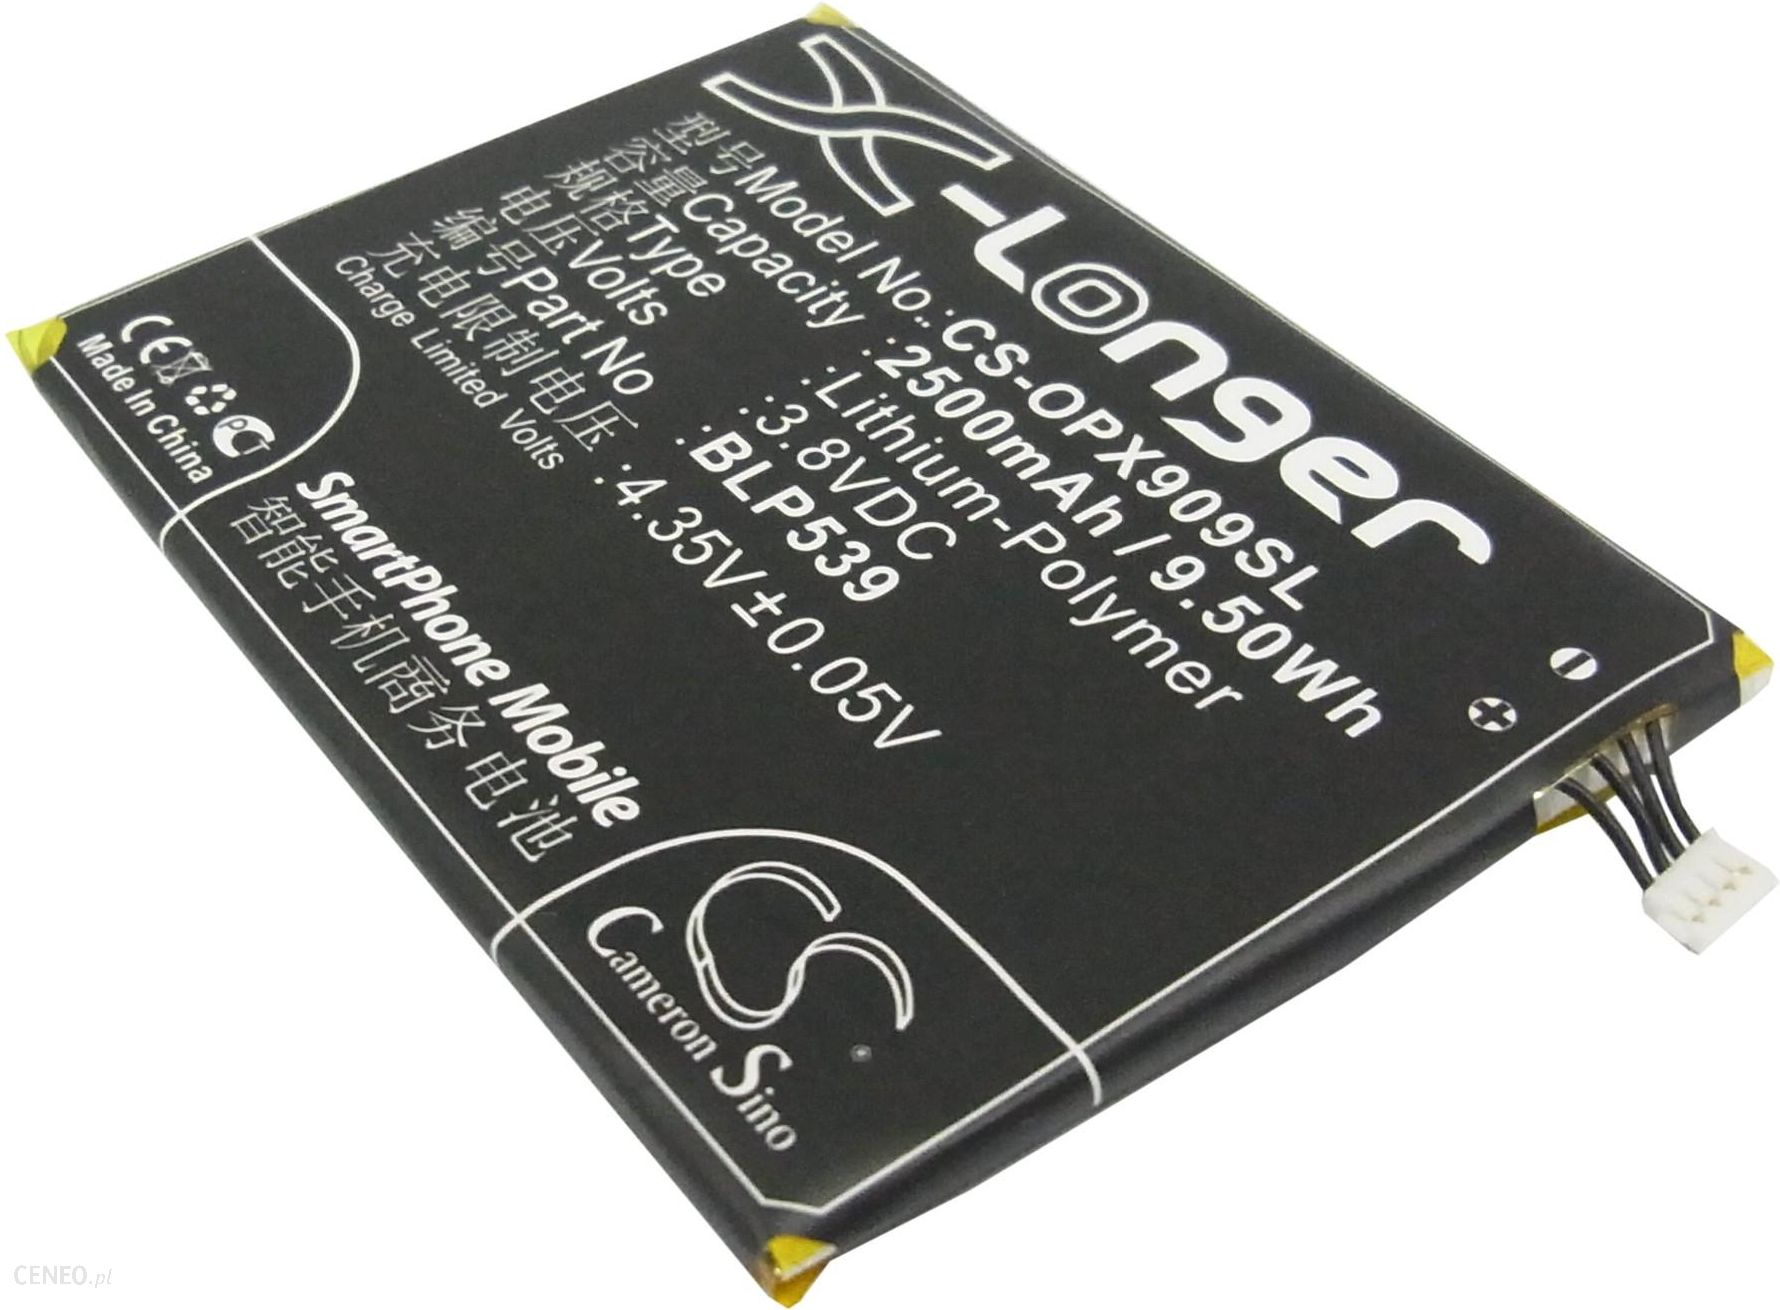 Bateria Cameron Sino Oppo Find 5 Blp539 2500Mah 9 50Wh Li Polymer 3 8V